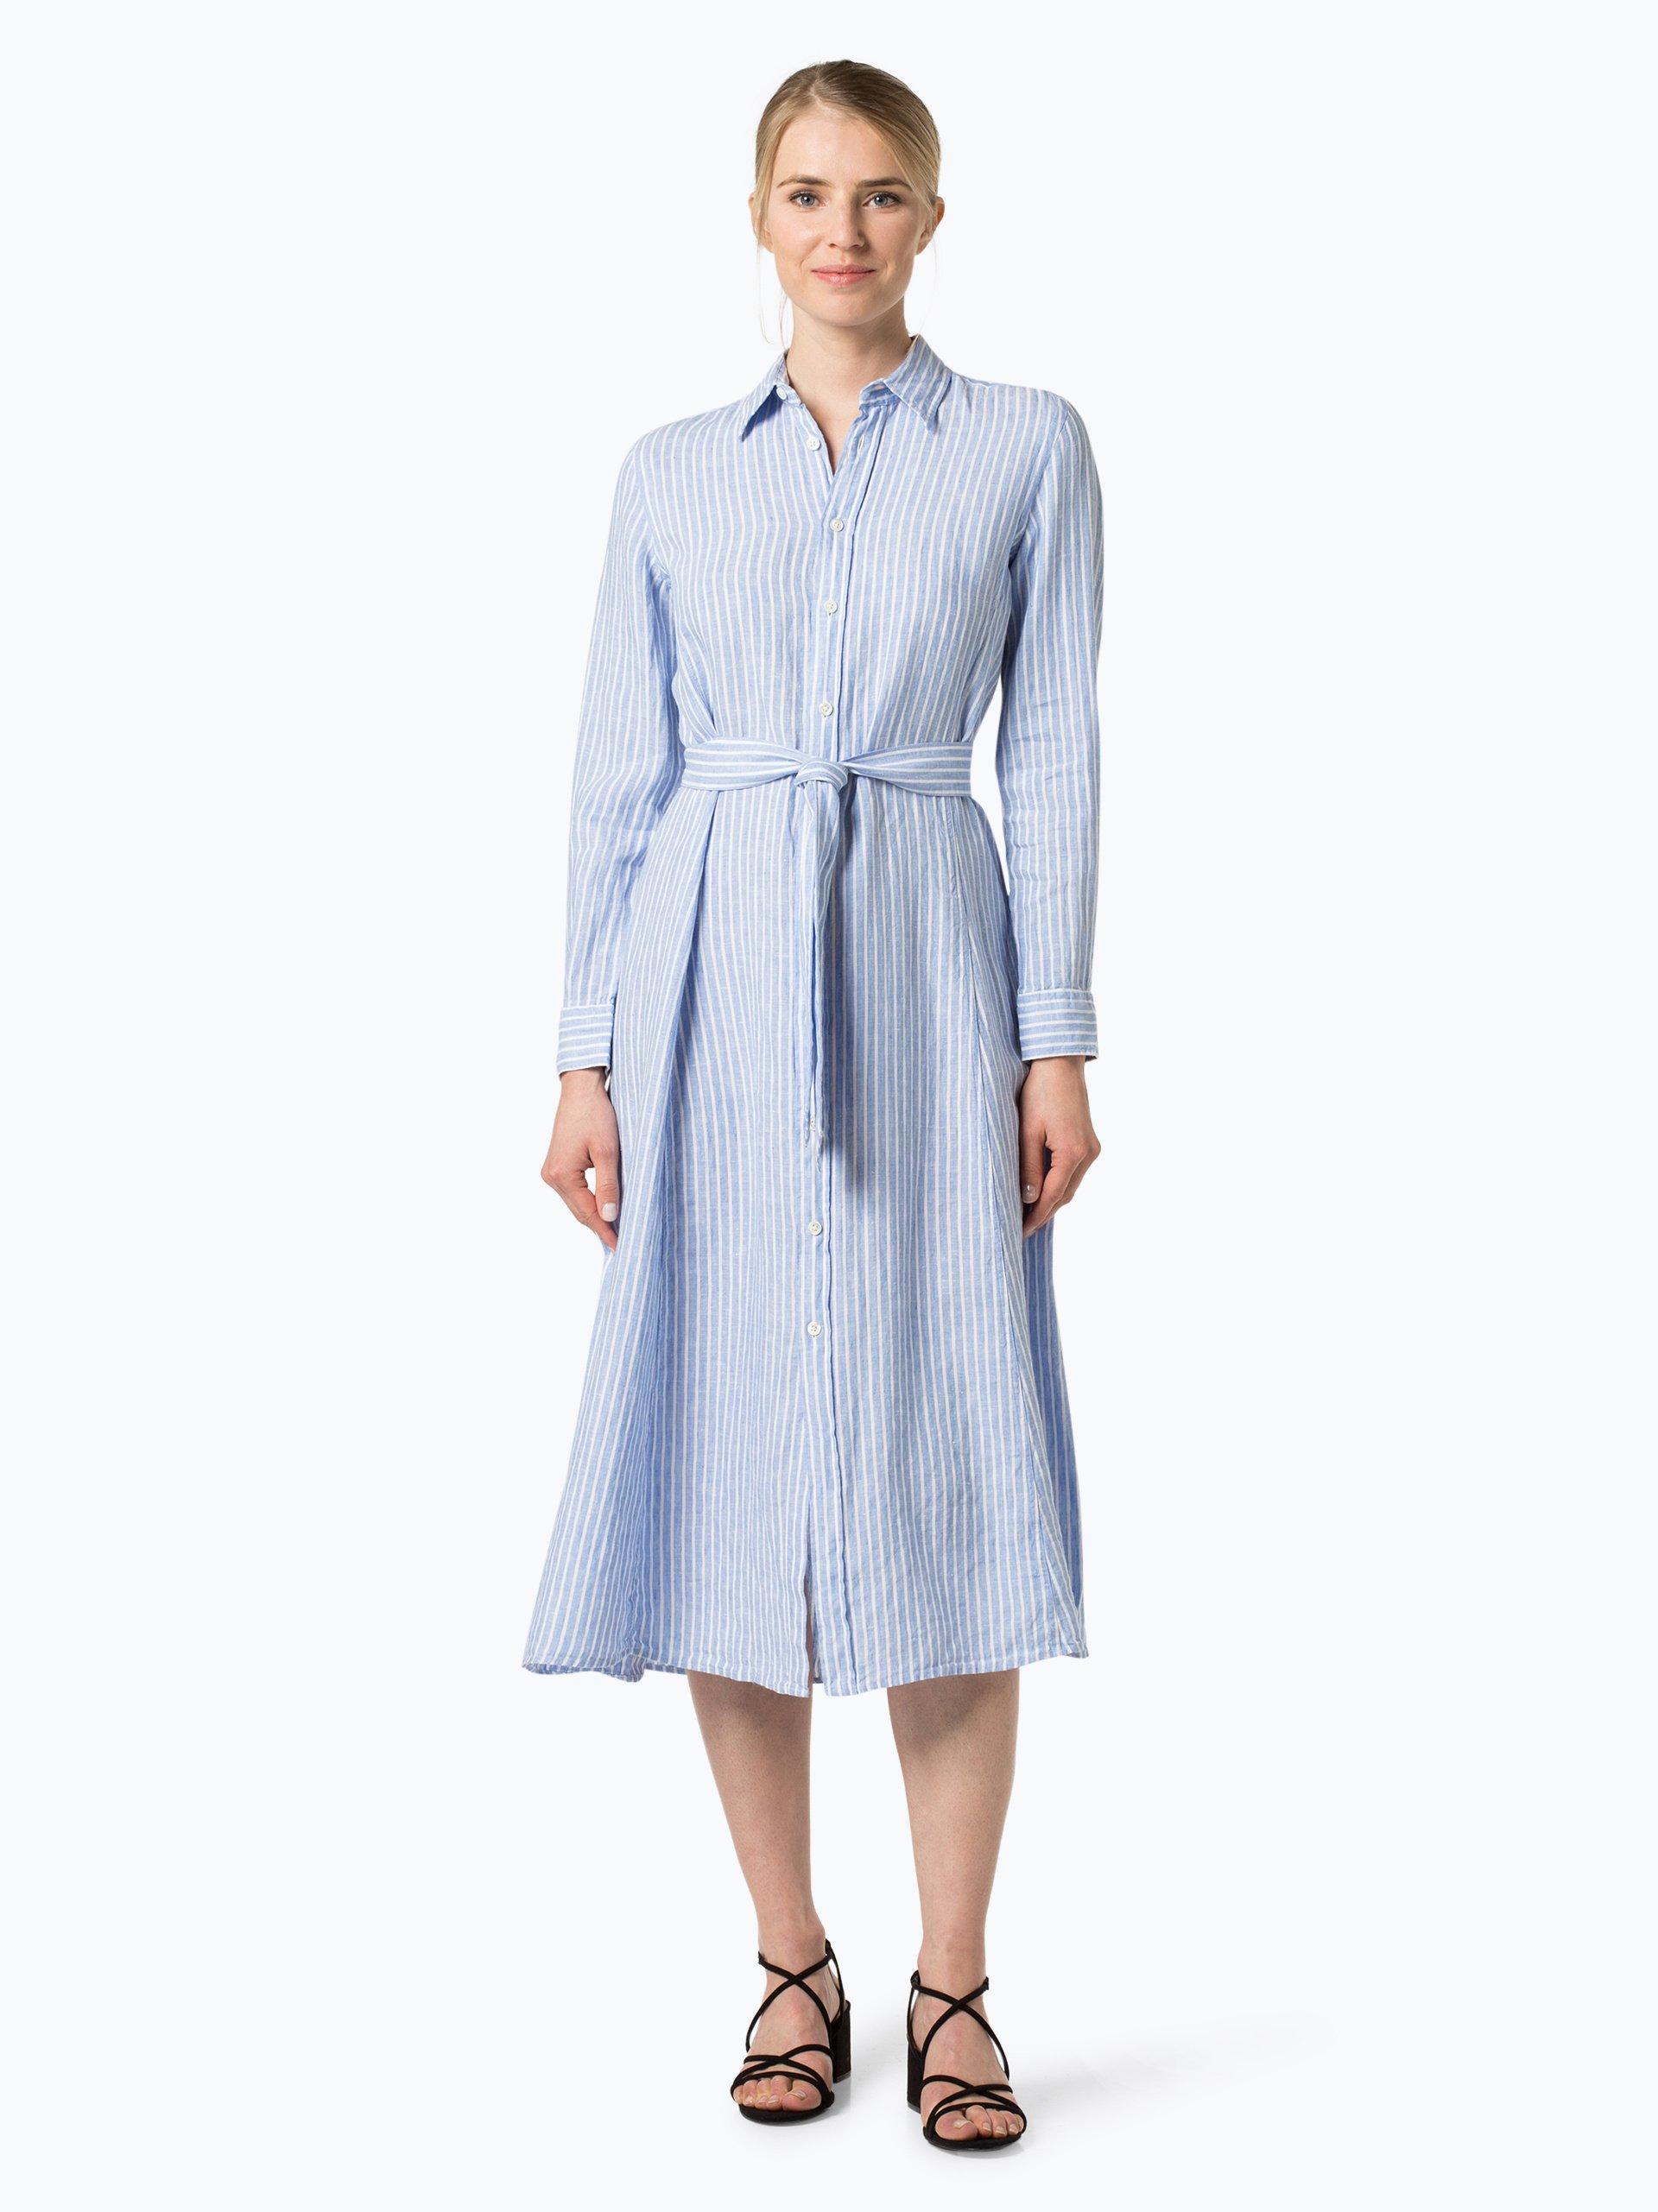 Polo Ralph Lauren Damen Leinenkleid